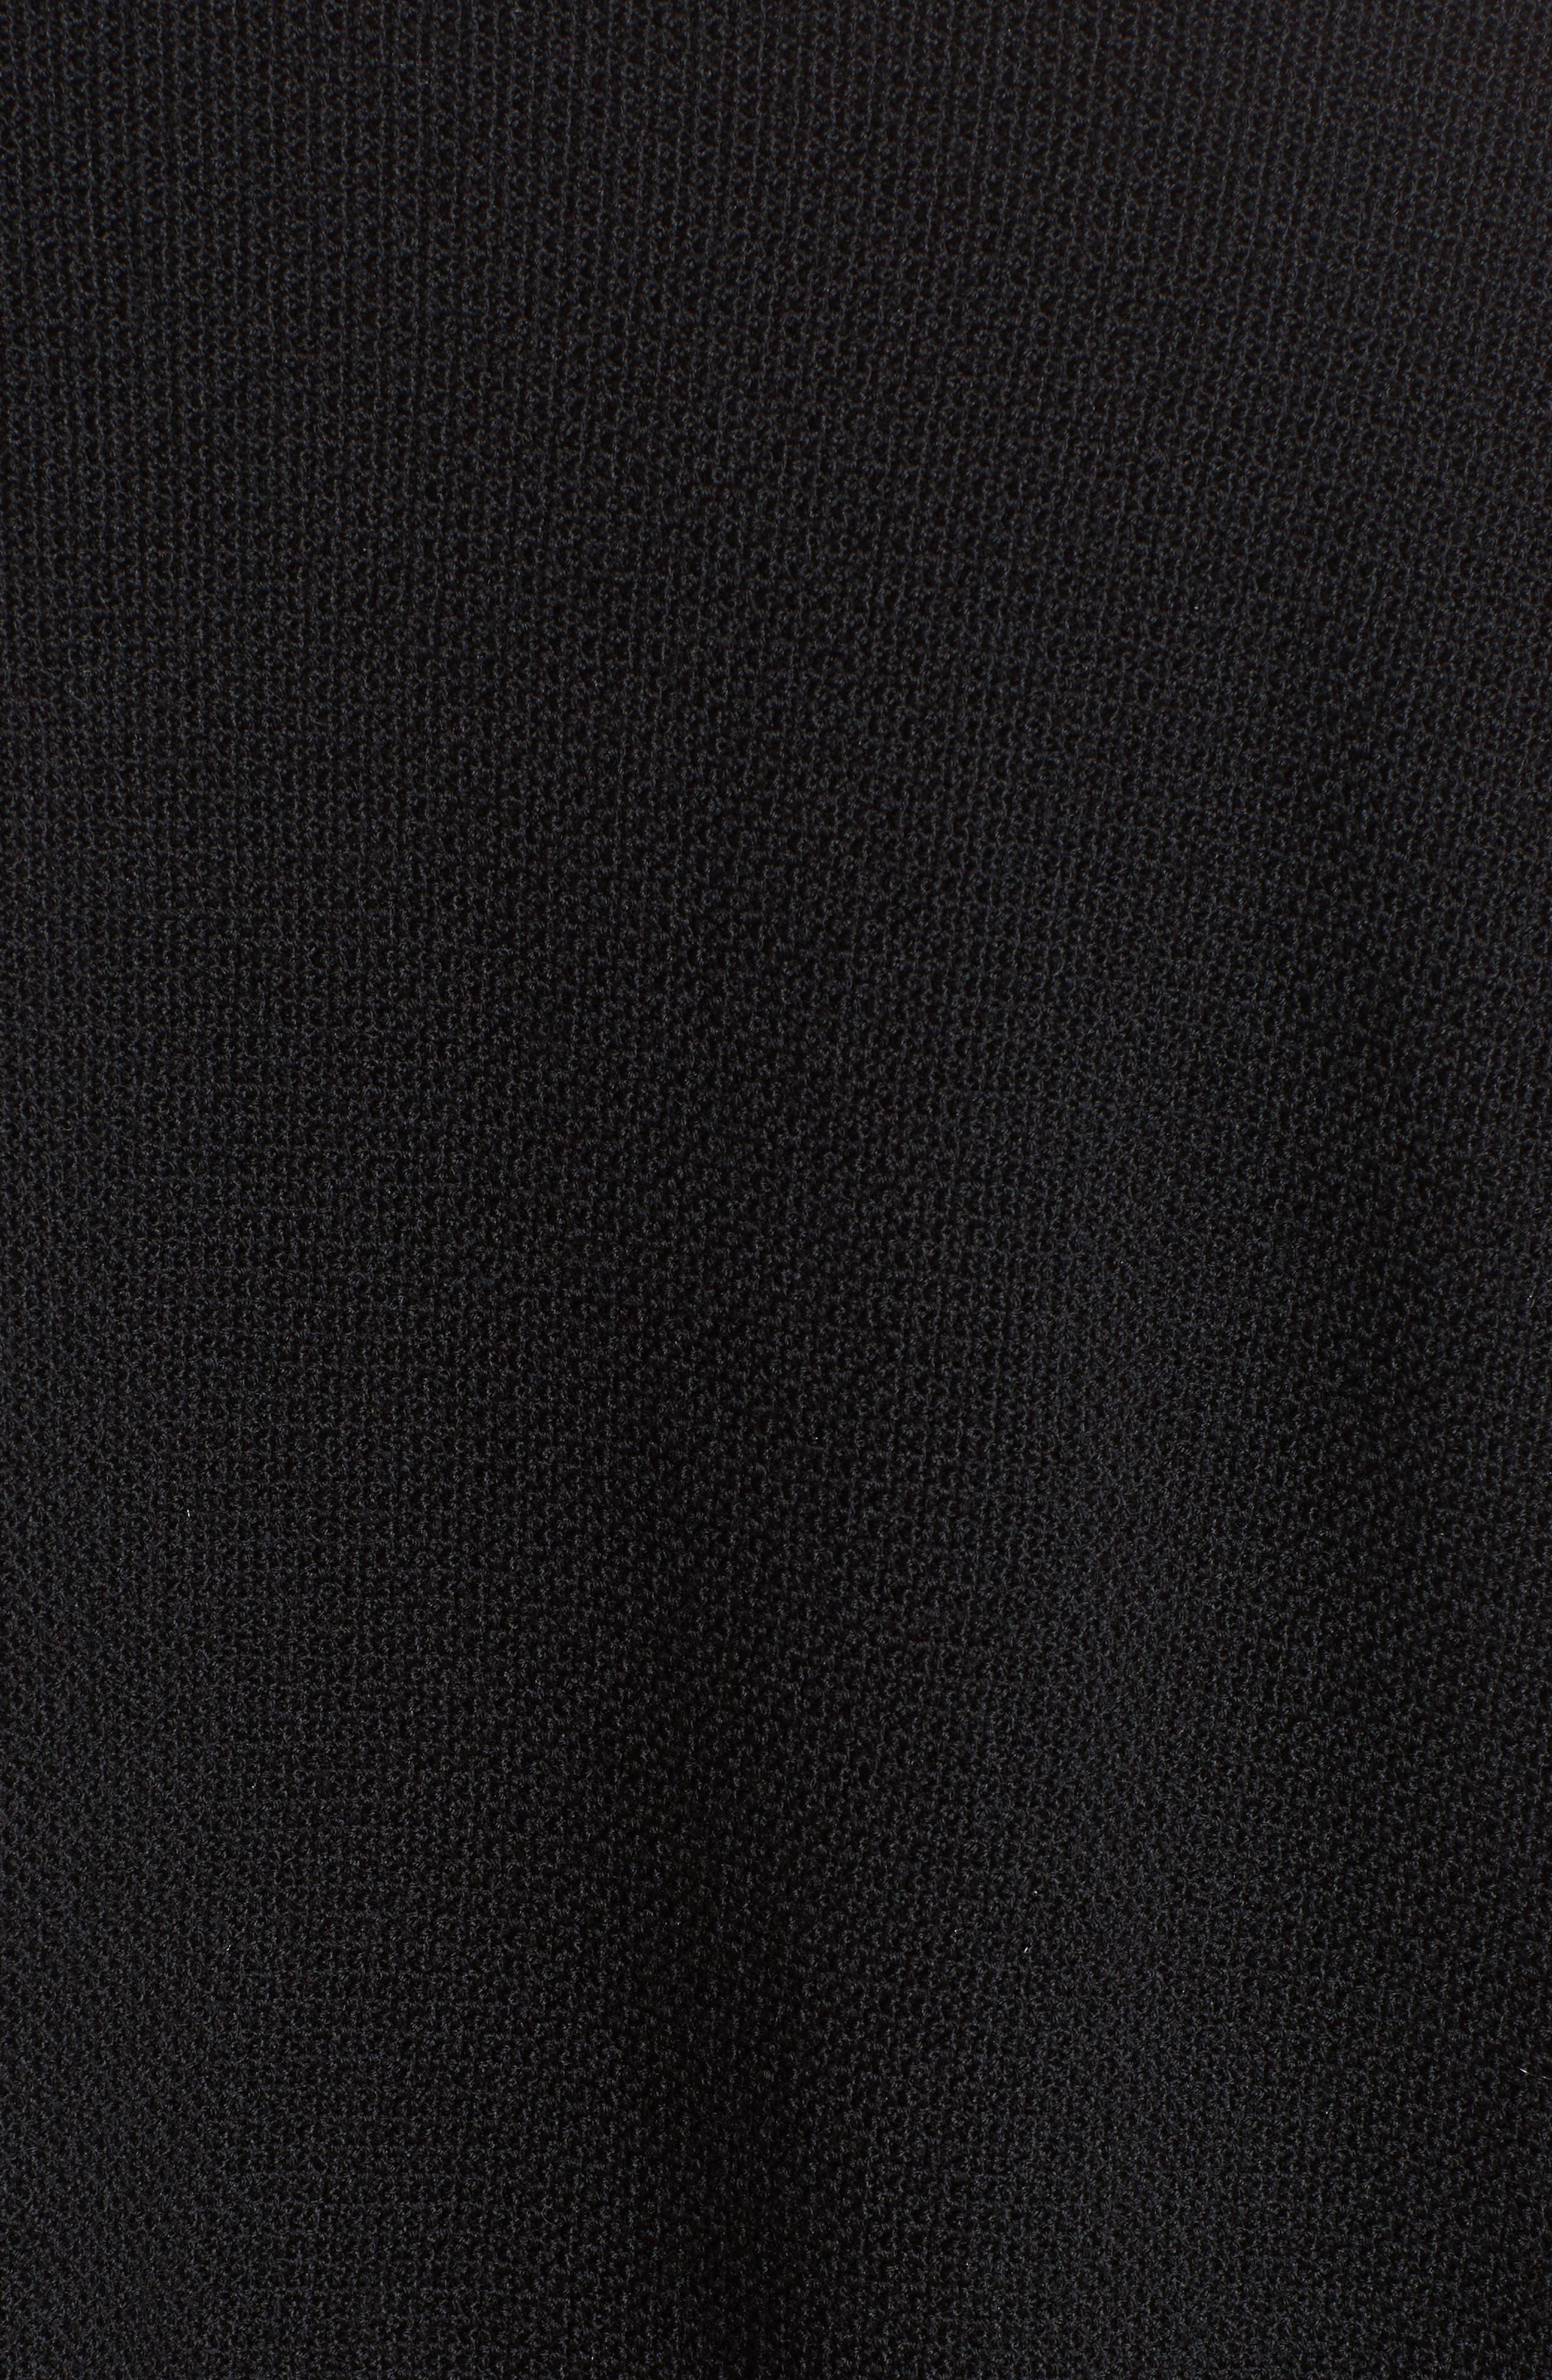 Dégradé Stripe Wool Cardigan,                             Alternate thumbnail 6, color,                             001